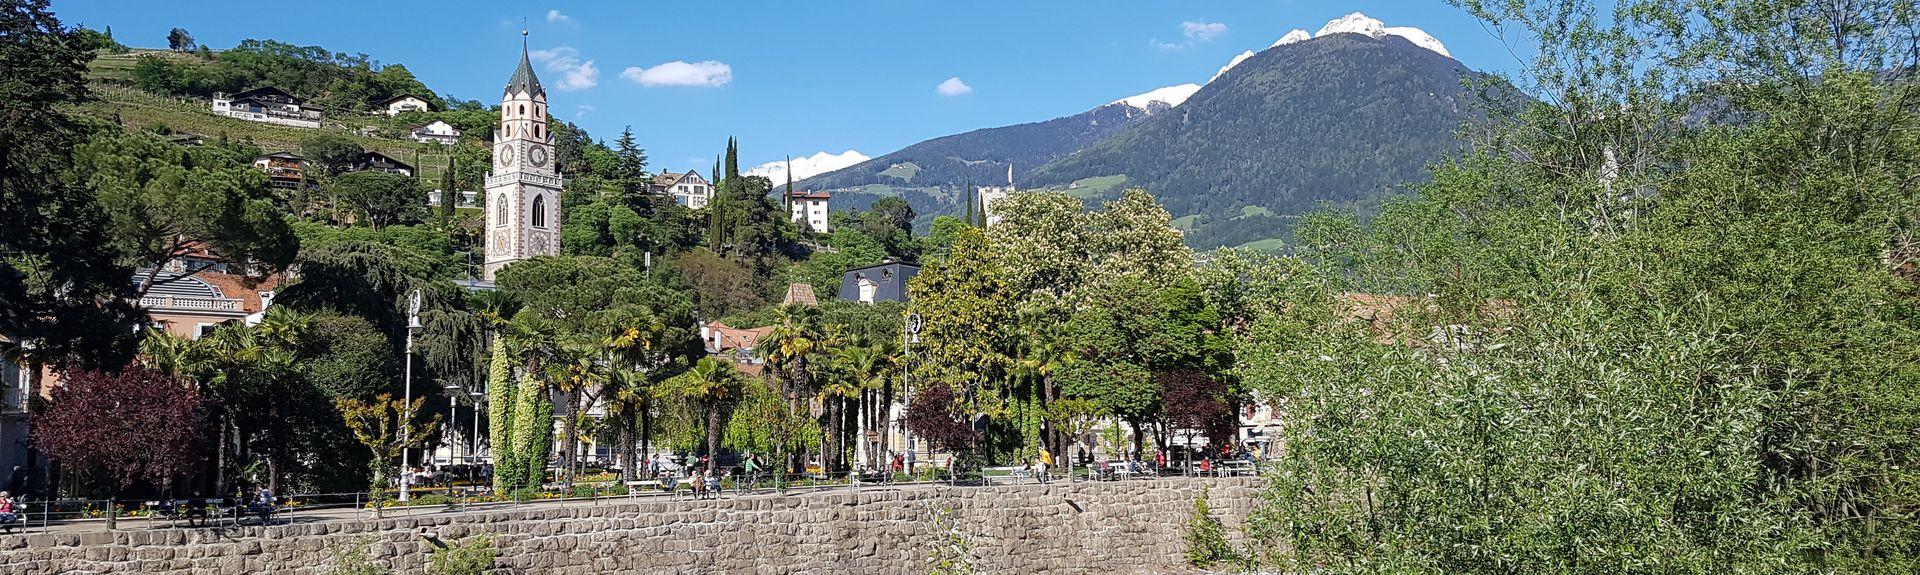 Vöran, Alto Adige, Trentino-Alto Adige/South Tyrol, Italy